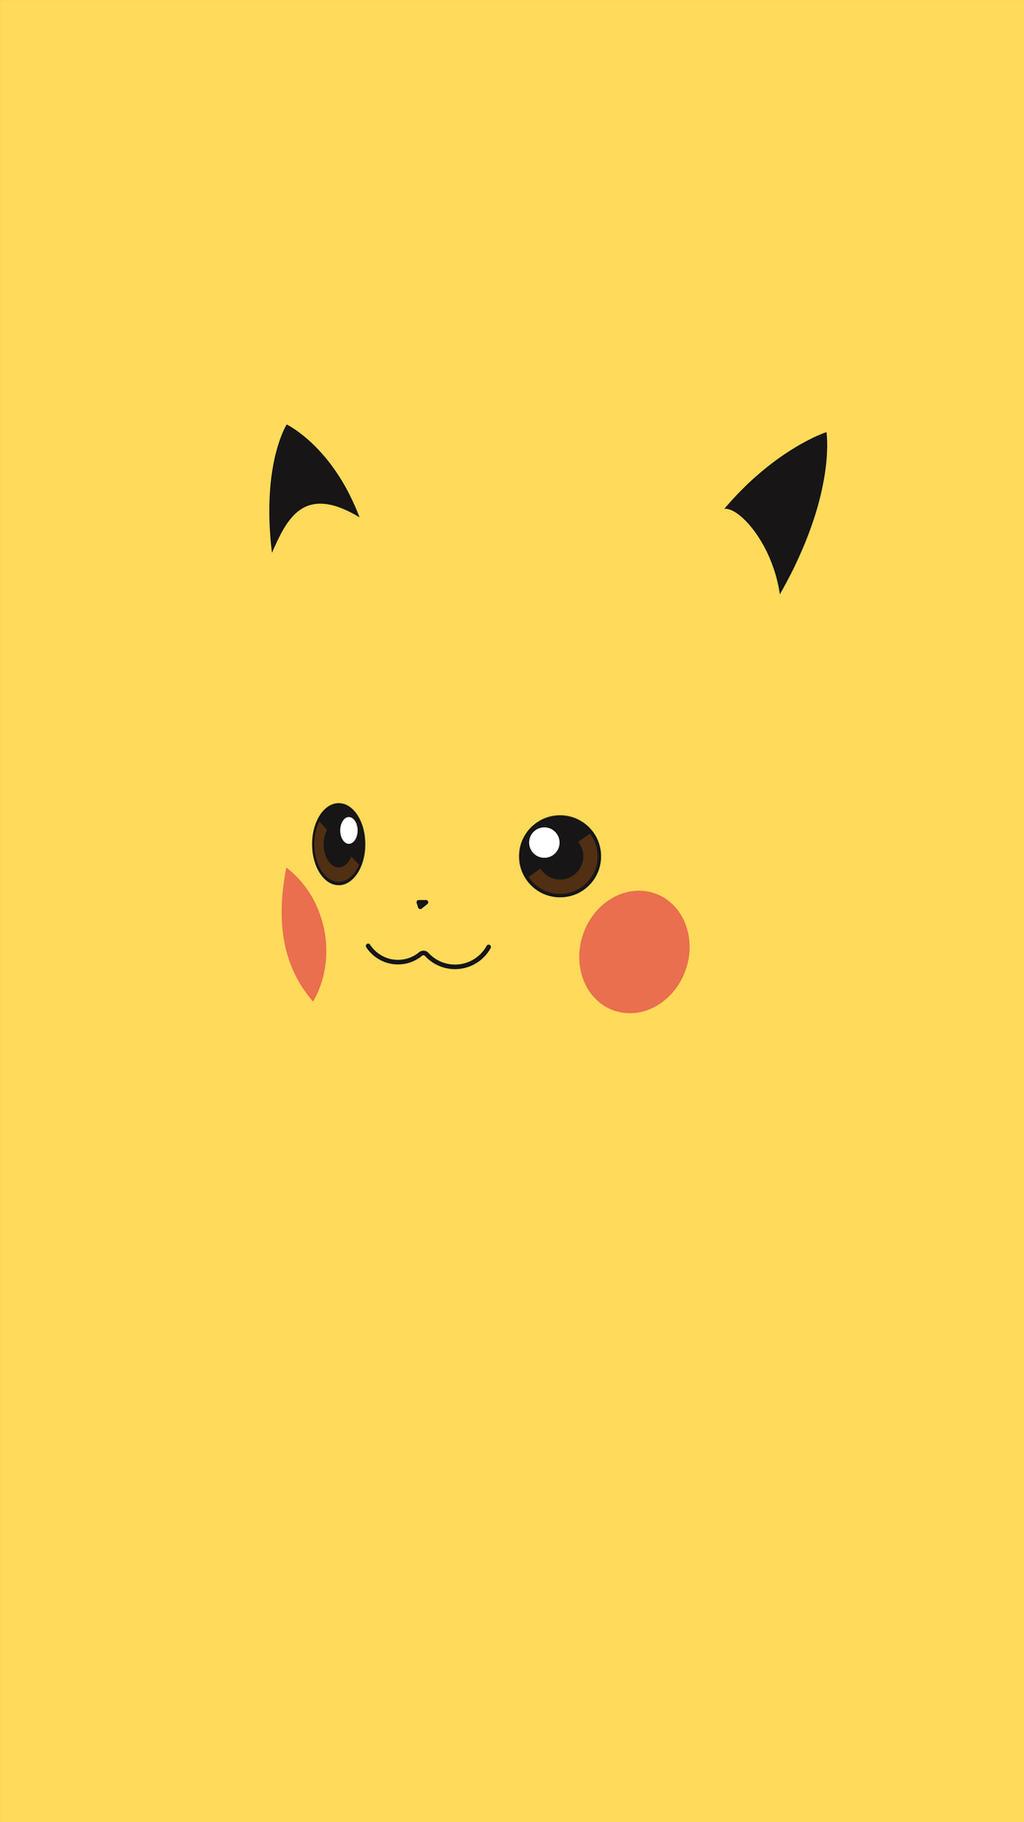 Iphone 6 Wallpaper Pikachu By Shelbobaggins On Deviantart